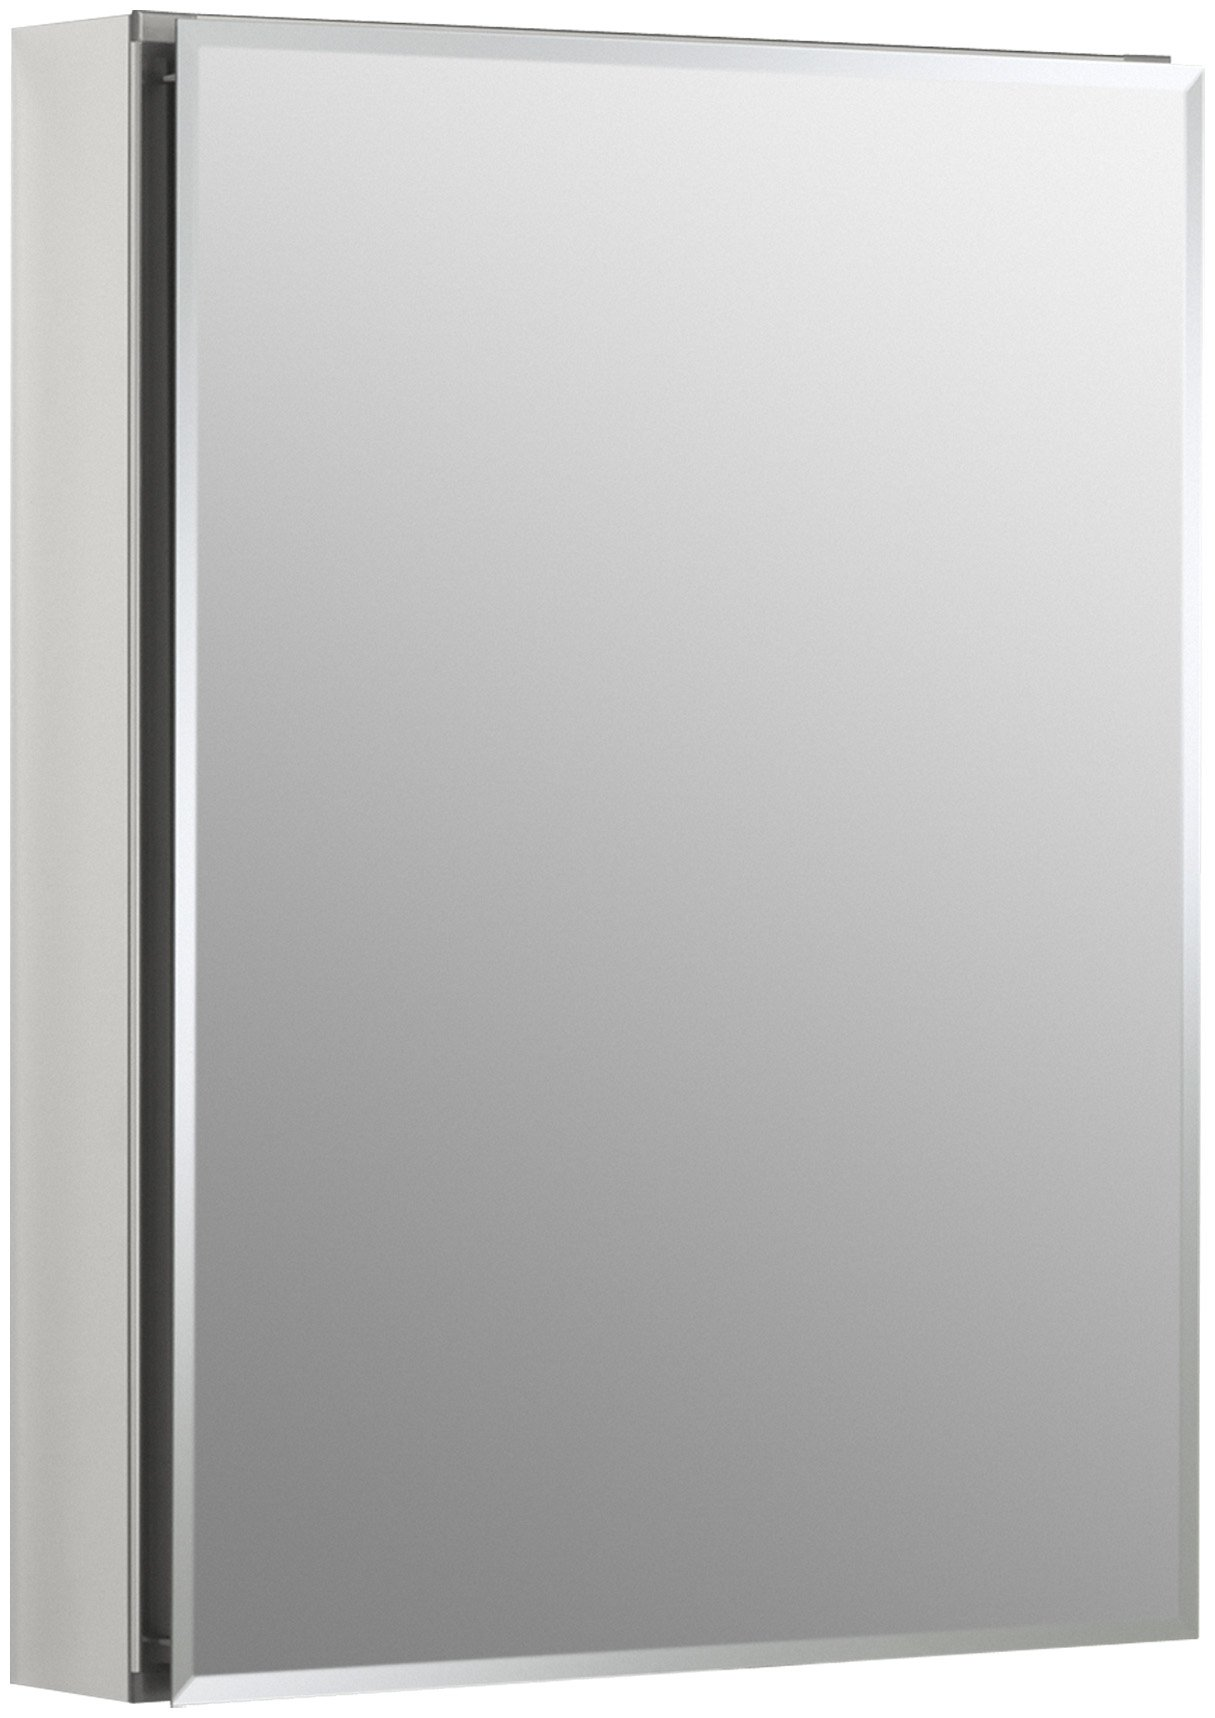 KOHLER K-CB-CLC2026FS Frameless 20 inch x 26 inch Aluminum Bathroom Medicine Cabinet; ; Recess or Surface Mount by Kohler